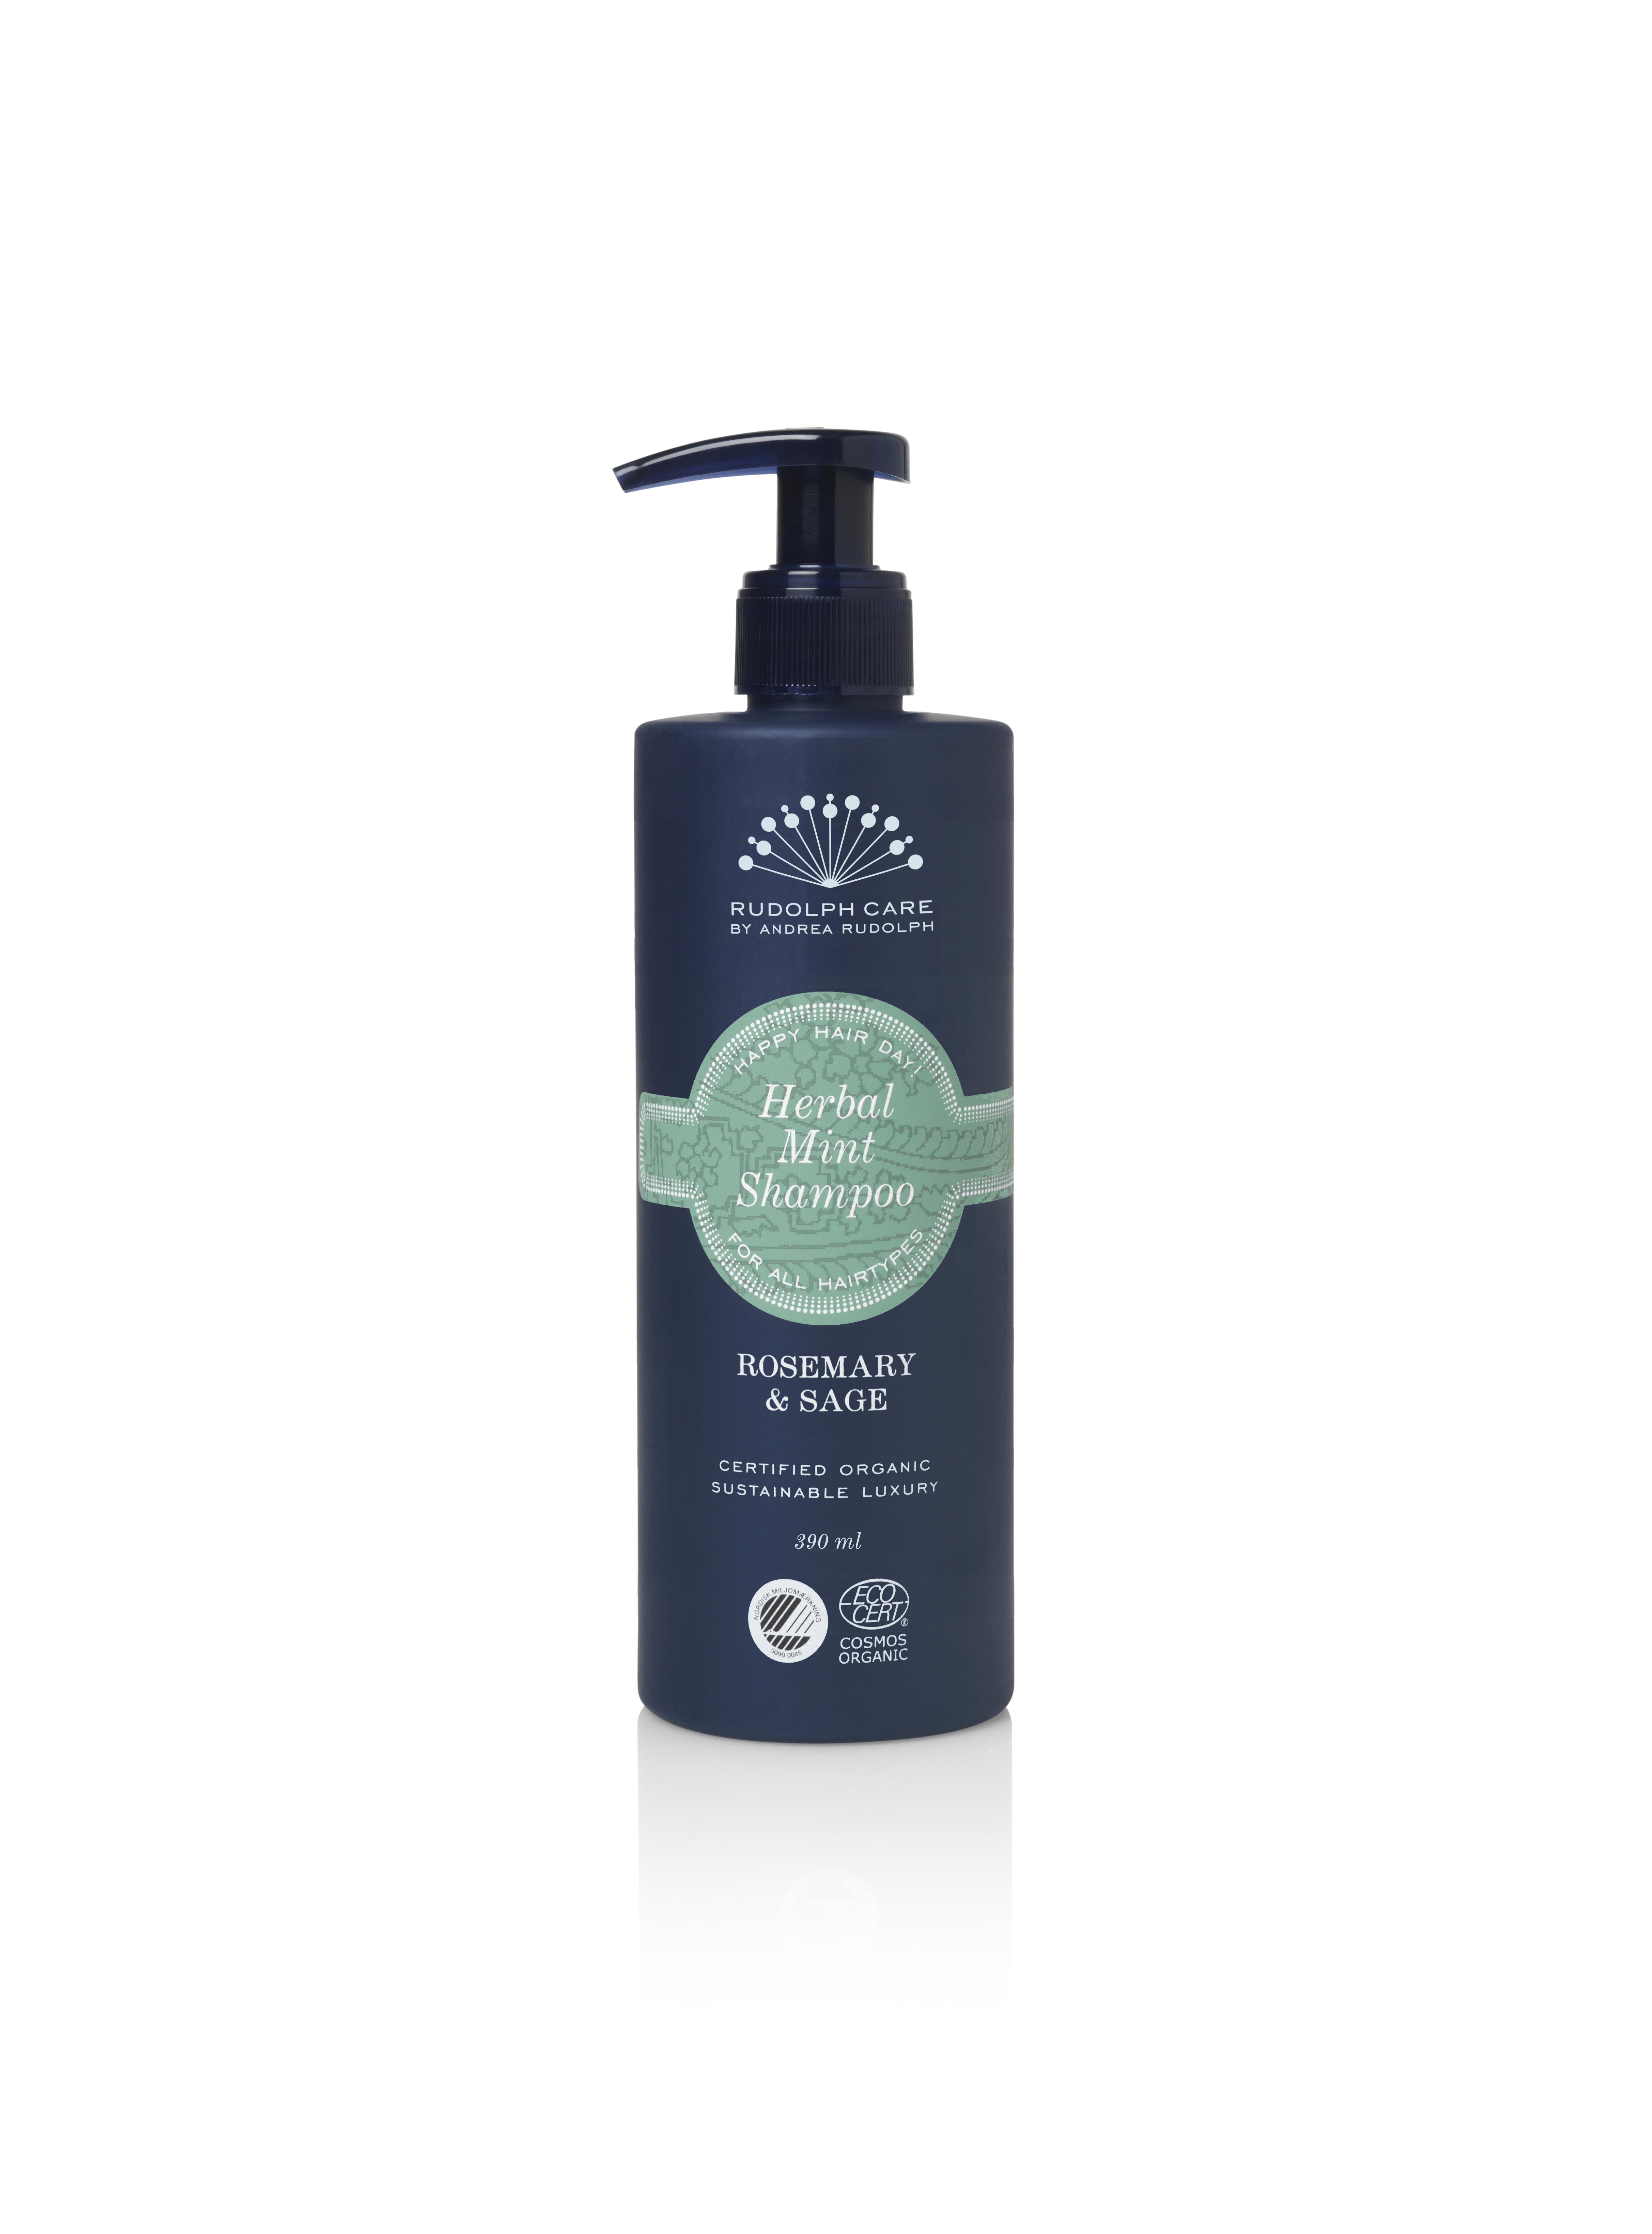 Rudolph Care Herbal Mint Shampoo, 390 ml